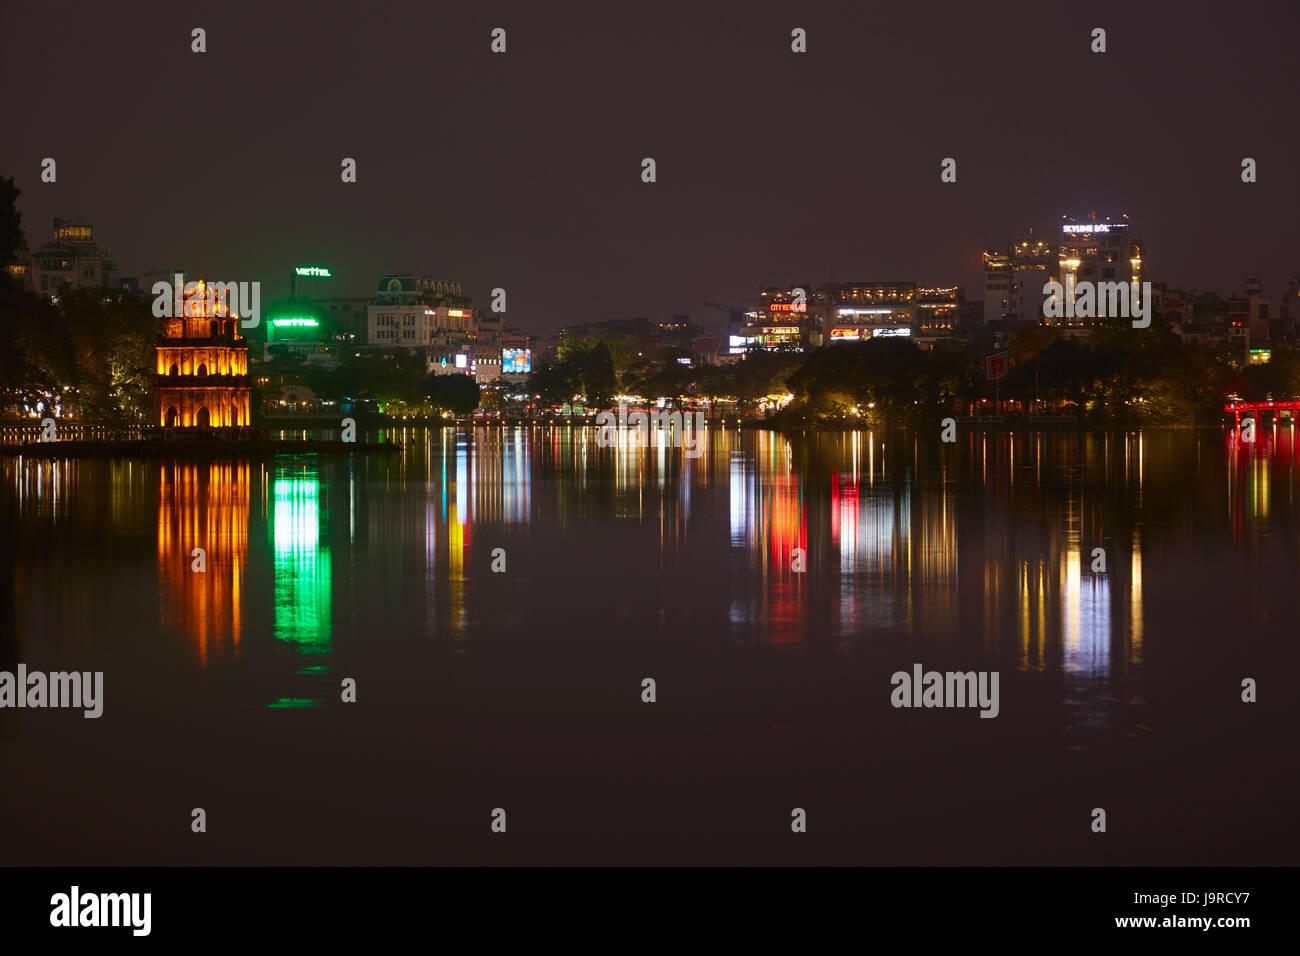 Turtle Tower at night, Hoan Kiem Lake, Hanoi, Vietnam - Stock Image